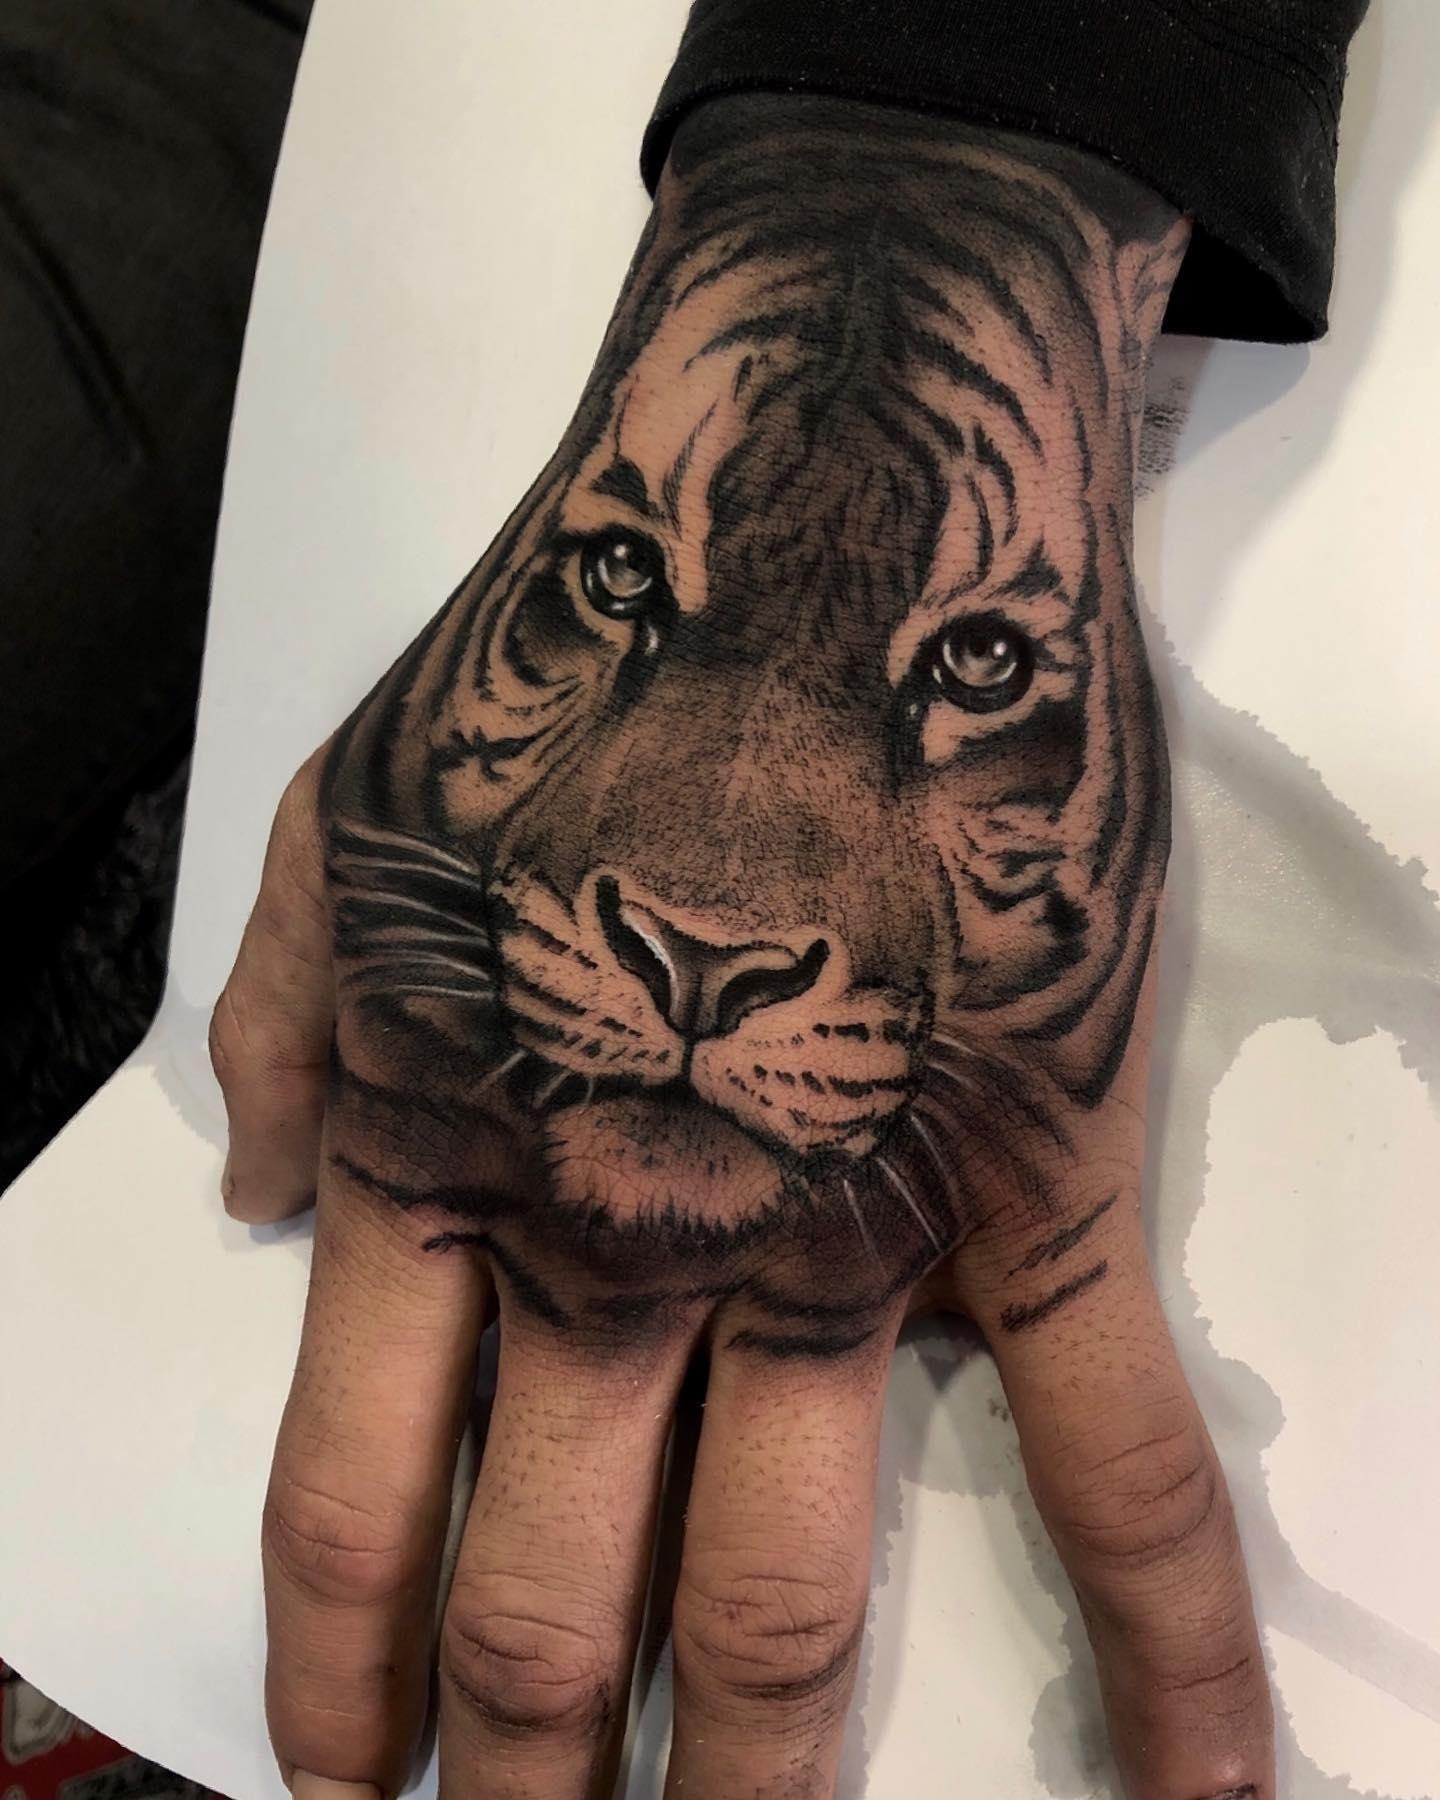 unreal.tattoos - Artist: @juan_tabasco_tattooer - #amazingtattoo #tattoos_alday #freshtattoo #amazingtattoos #cooltattoos #tattooculture #tattooartwork #tattooaddict #tattooinspiration #tattoos #tattooworld #tattoosketch #tattoosociety #tattoomodels #tattoos_of_instagram #tattoooftheday #inkedlife #inklife #tattoomodel #inkaholik #tattooideas #tattoodesign #inktattoo #tattoolove #tattoosofinstagram #inkd #newtattoos #wowtattoo #tattoo